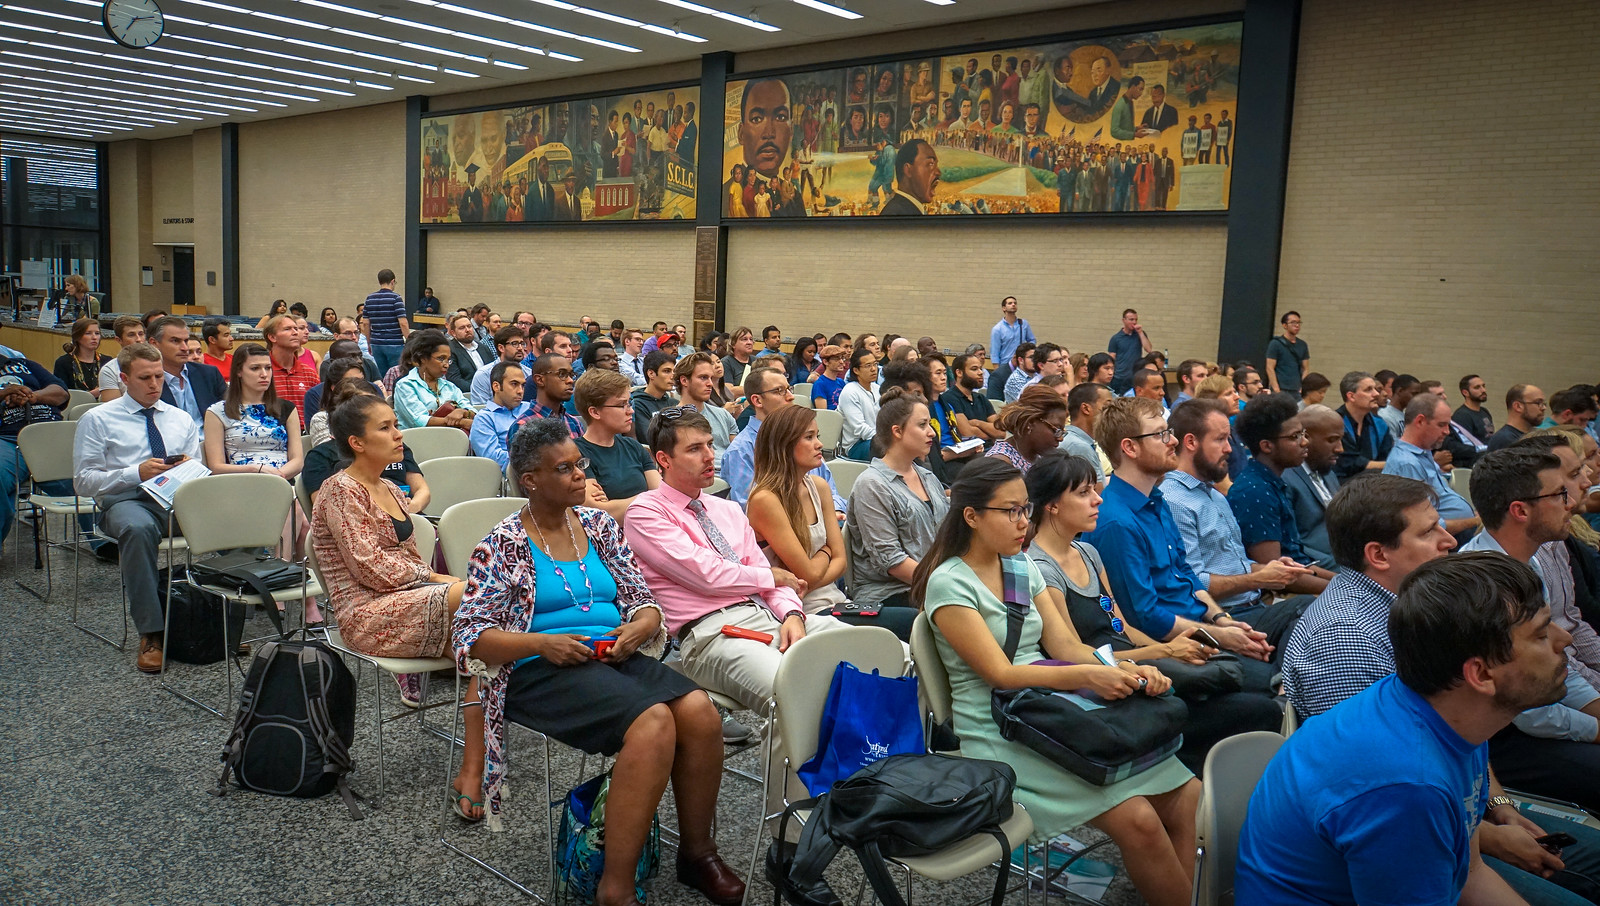 2016.09.20 DCTech Meetup, Washington, DC USA 08075